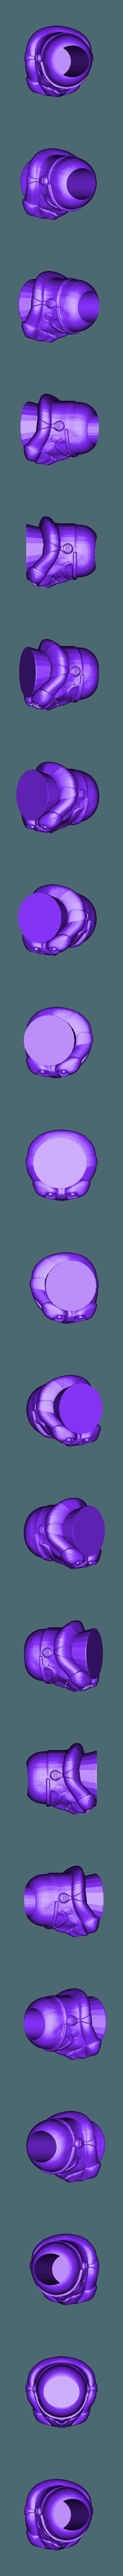 stormtrooper_pen_cup.stl Download free STL file Stormtrooper Pen Cup • 3D printable model, sjpiper145